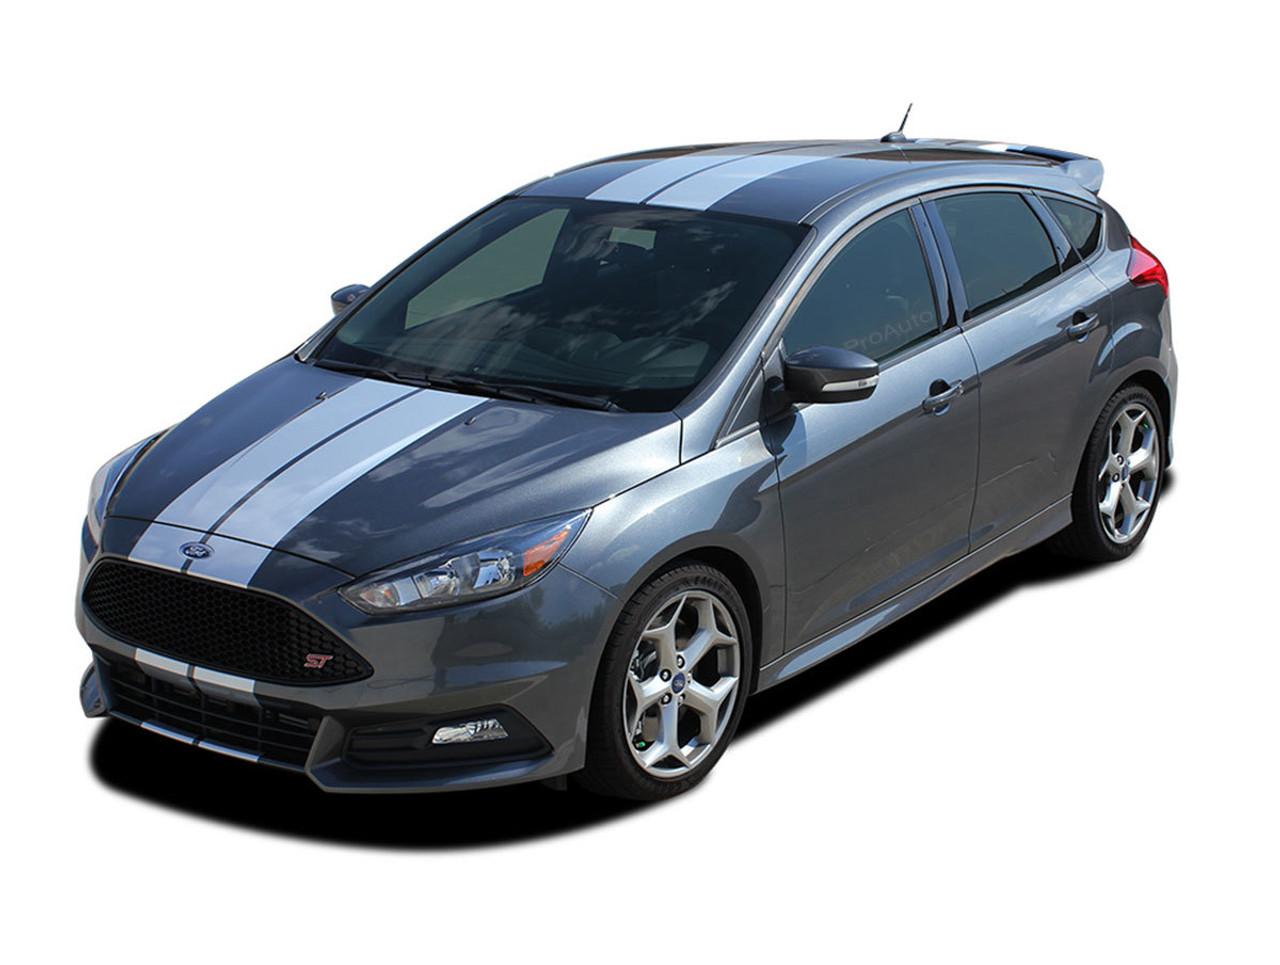 Ford Focus 2005-2019